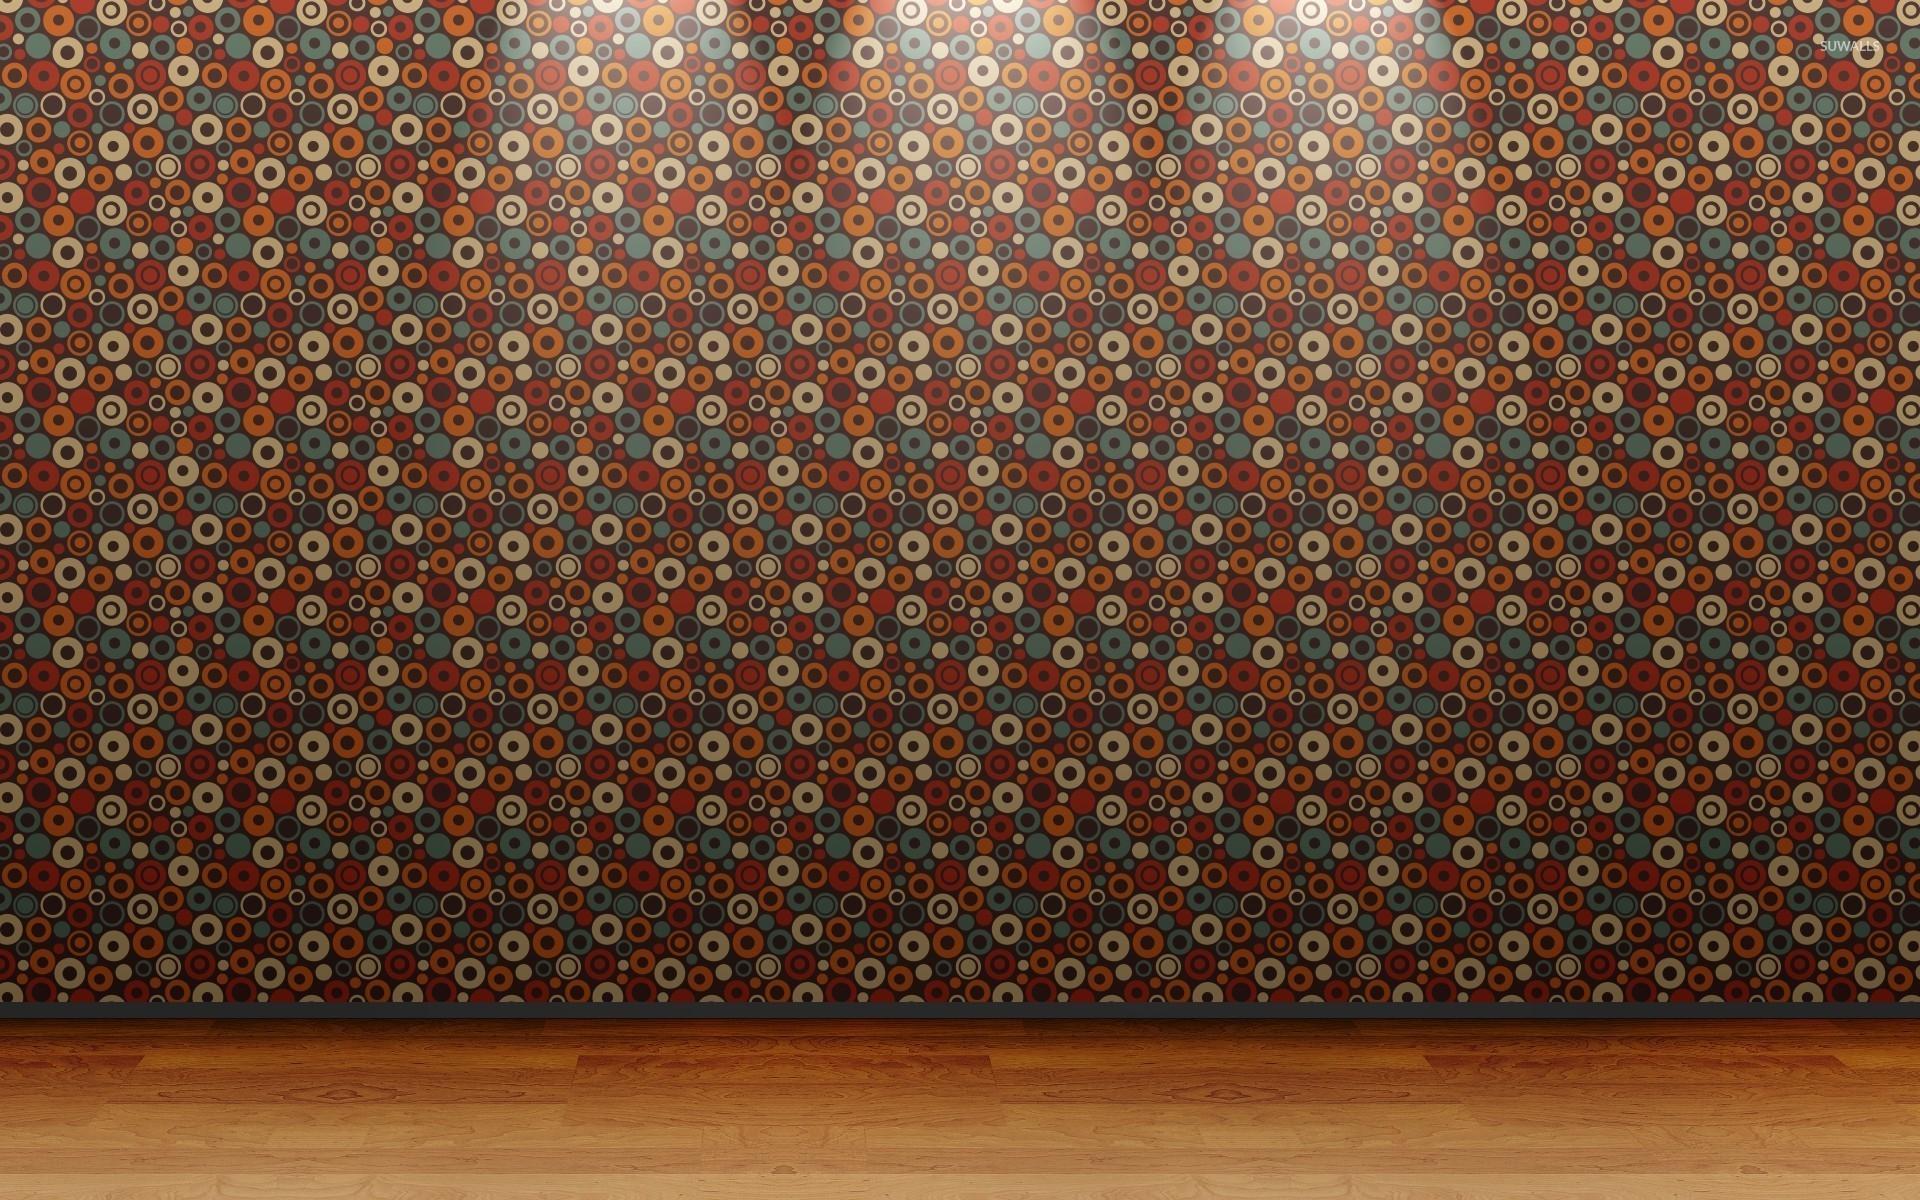 Retro circle wall pattern wallpaper digital art for Vintage wallpaper for walls